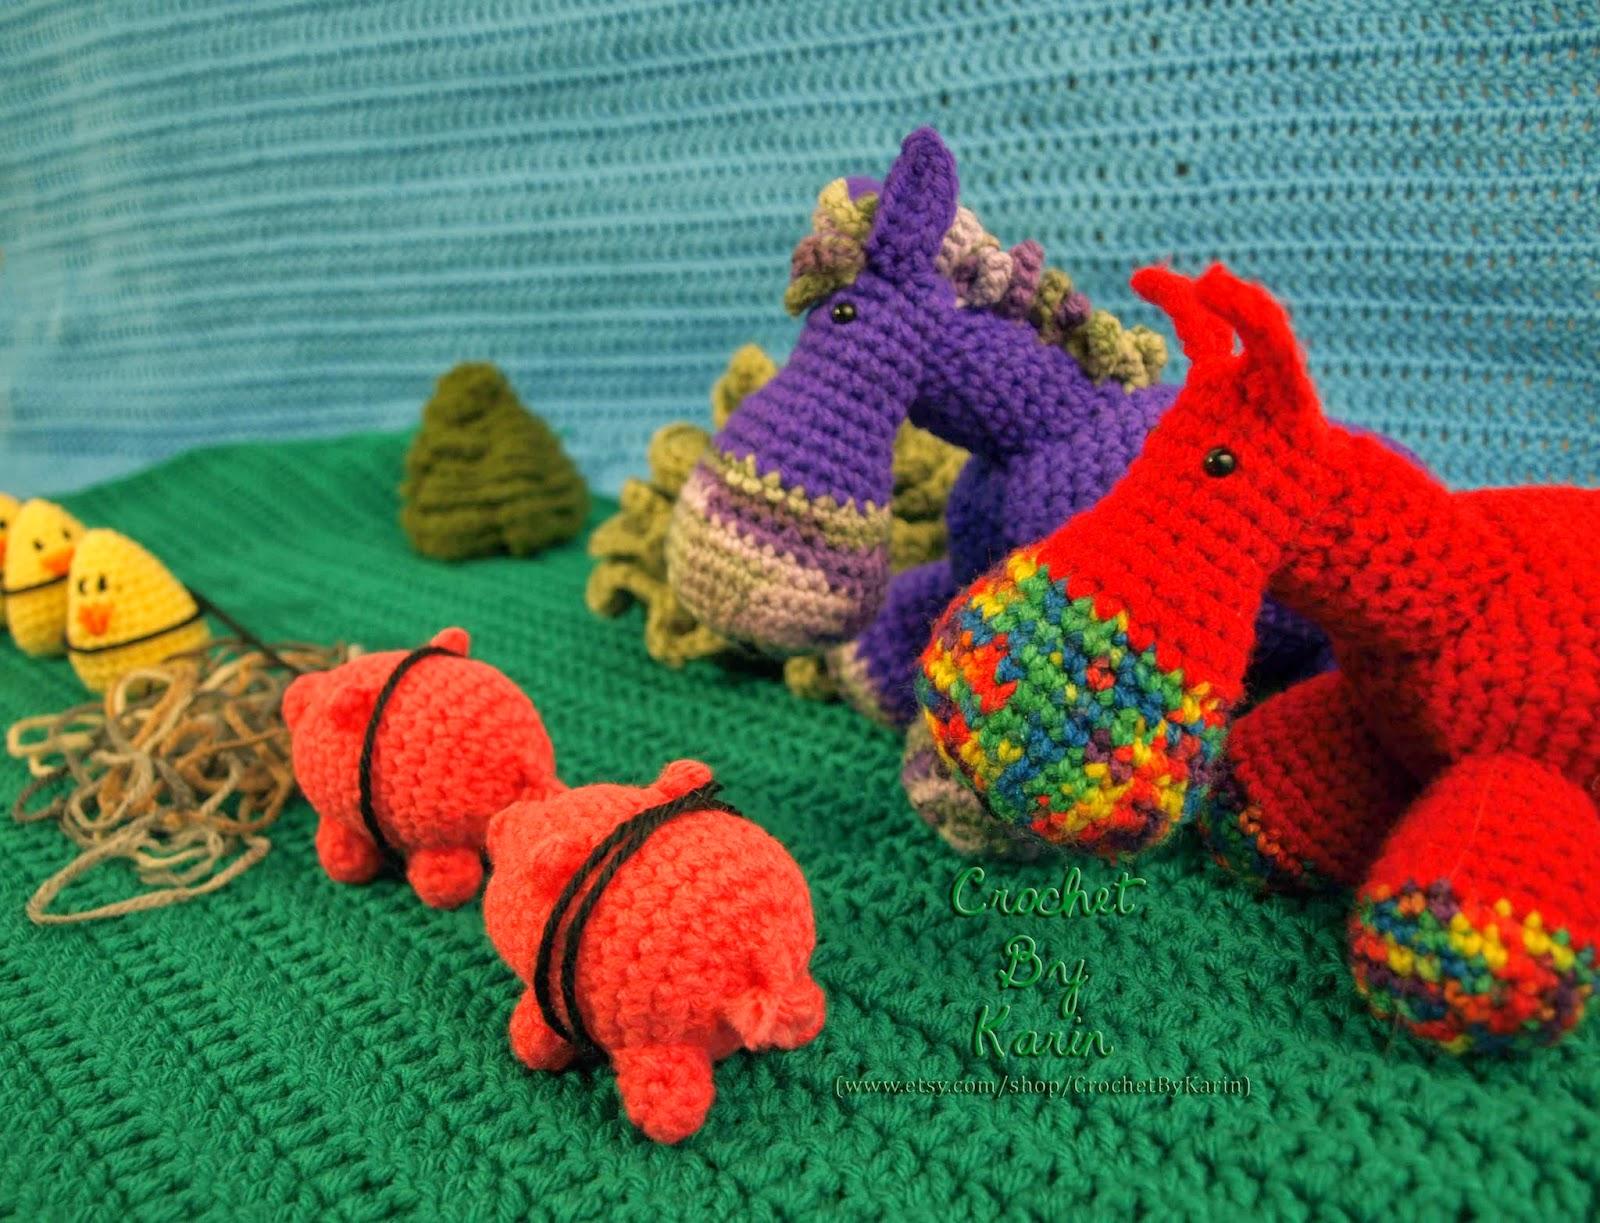 www.etsy.com/listing/128895477/crochet-baby-pig